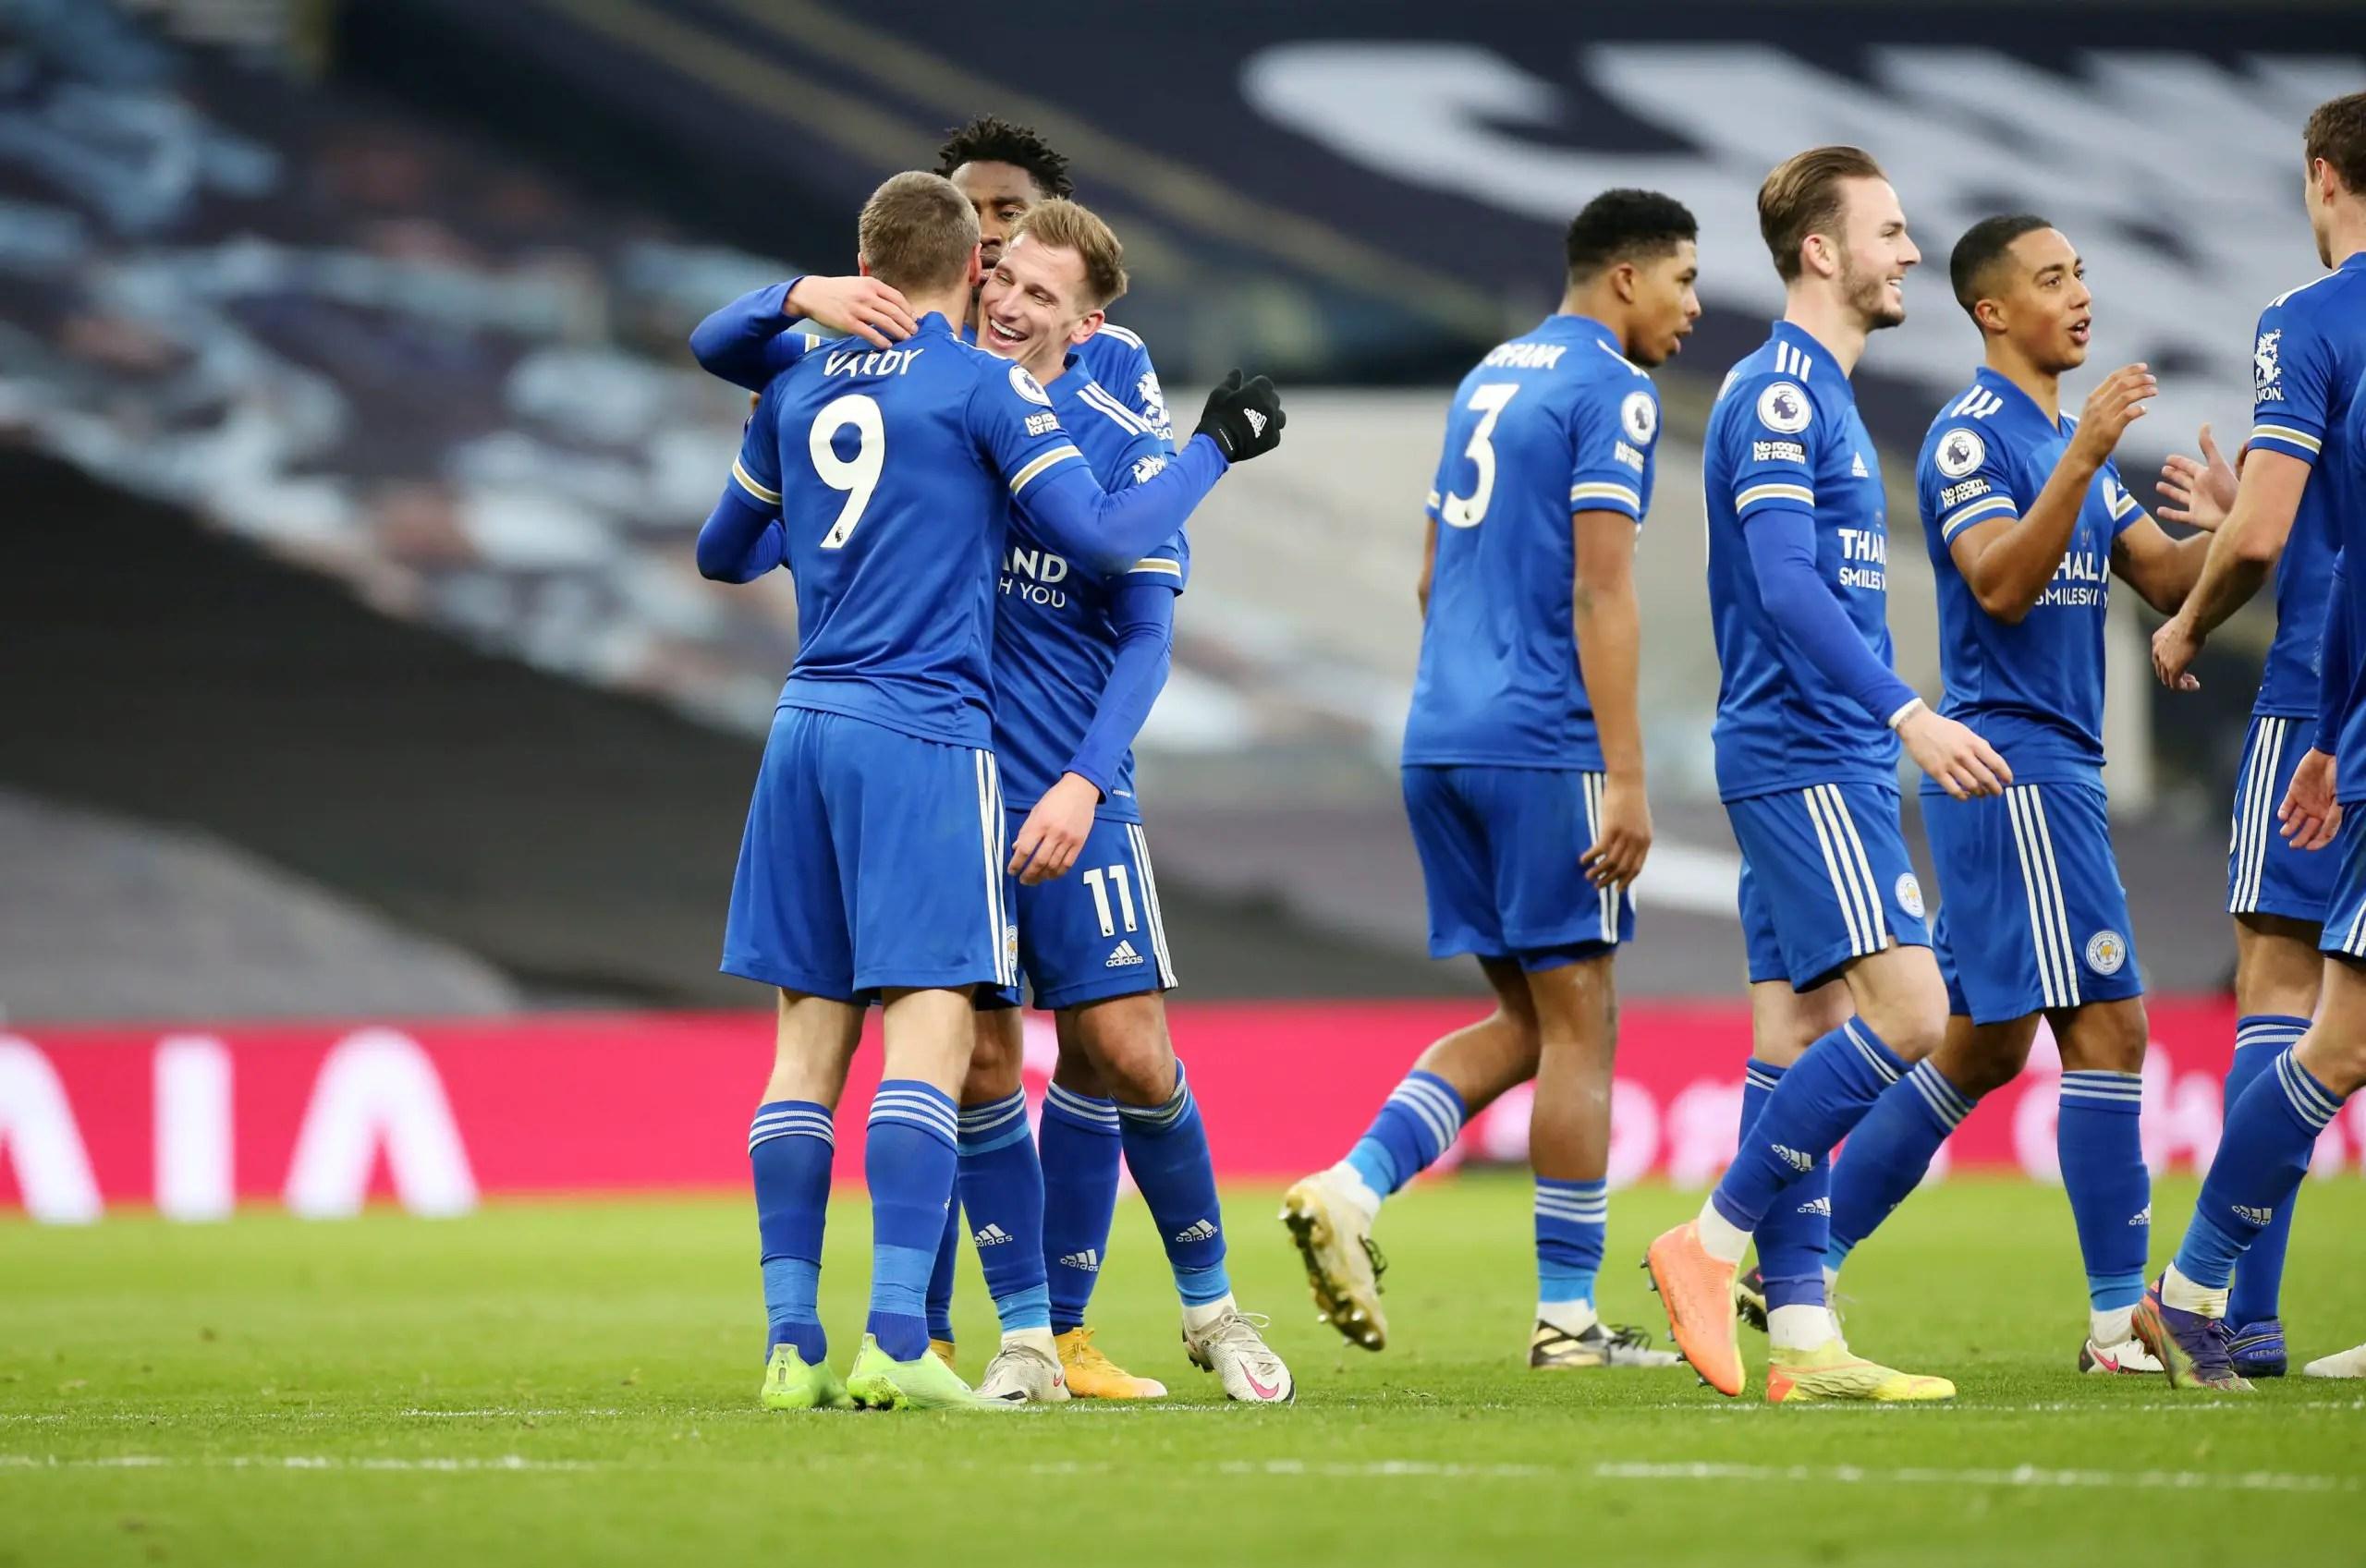 Premier League: Ndidi Shines As Leicester Pip Tottenham, Secure Second Spot